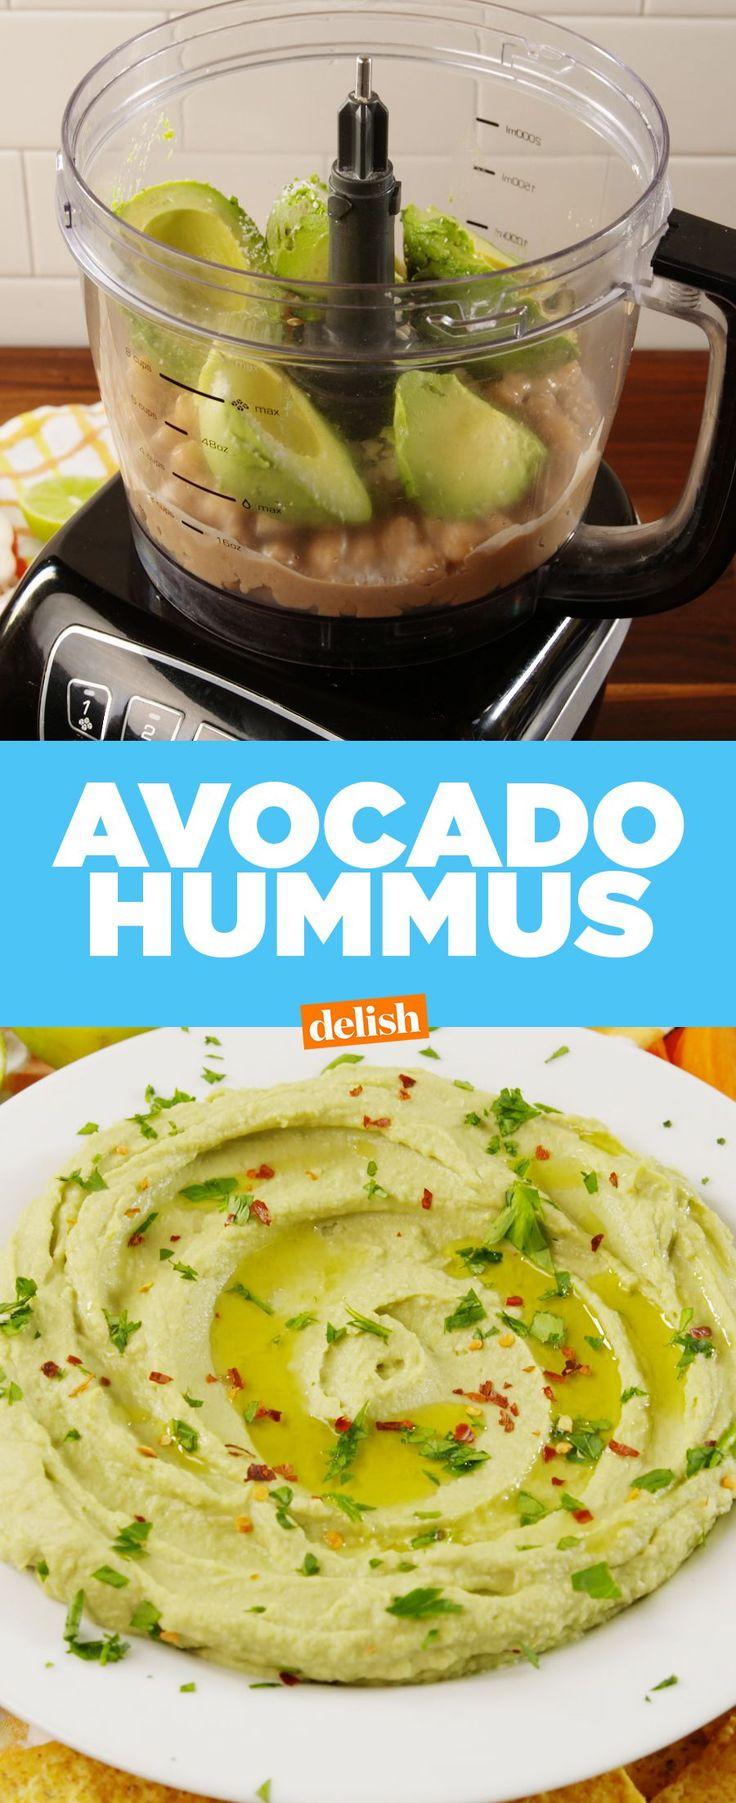 Avocado HummusDelish